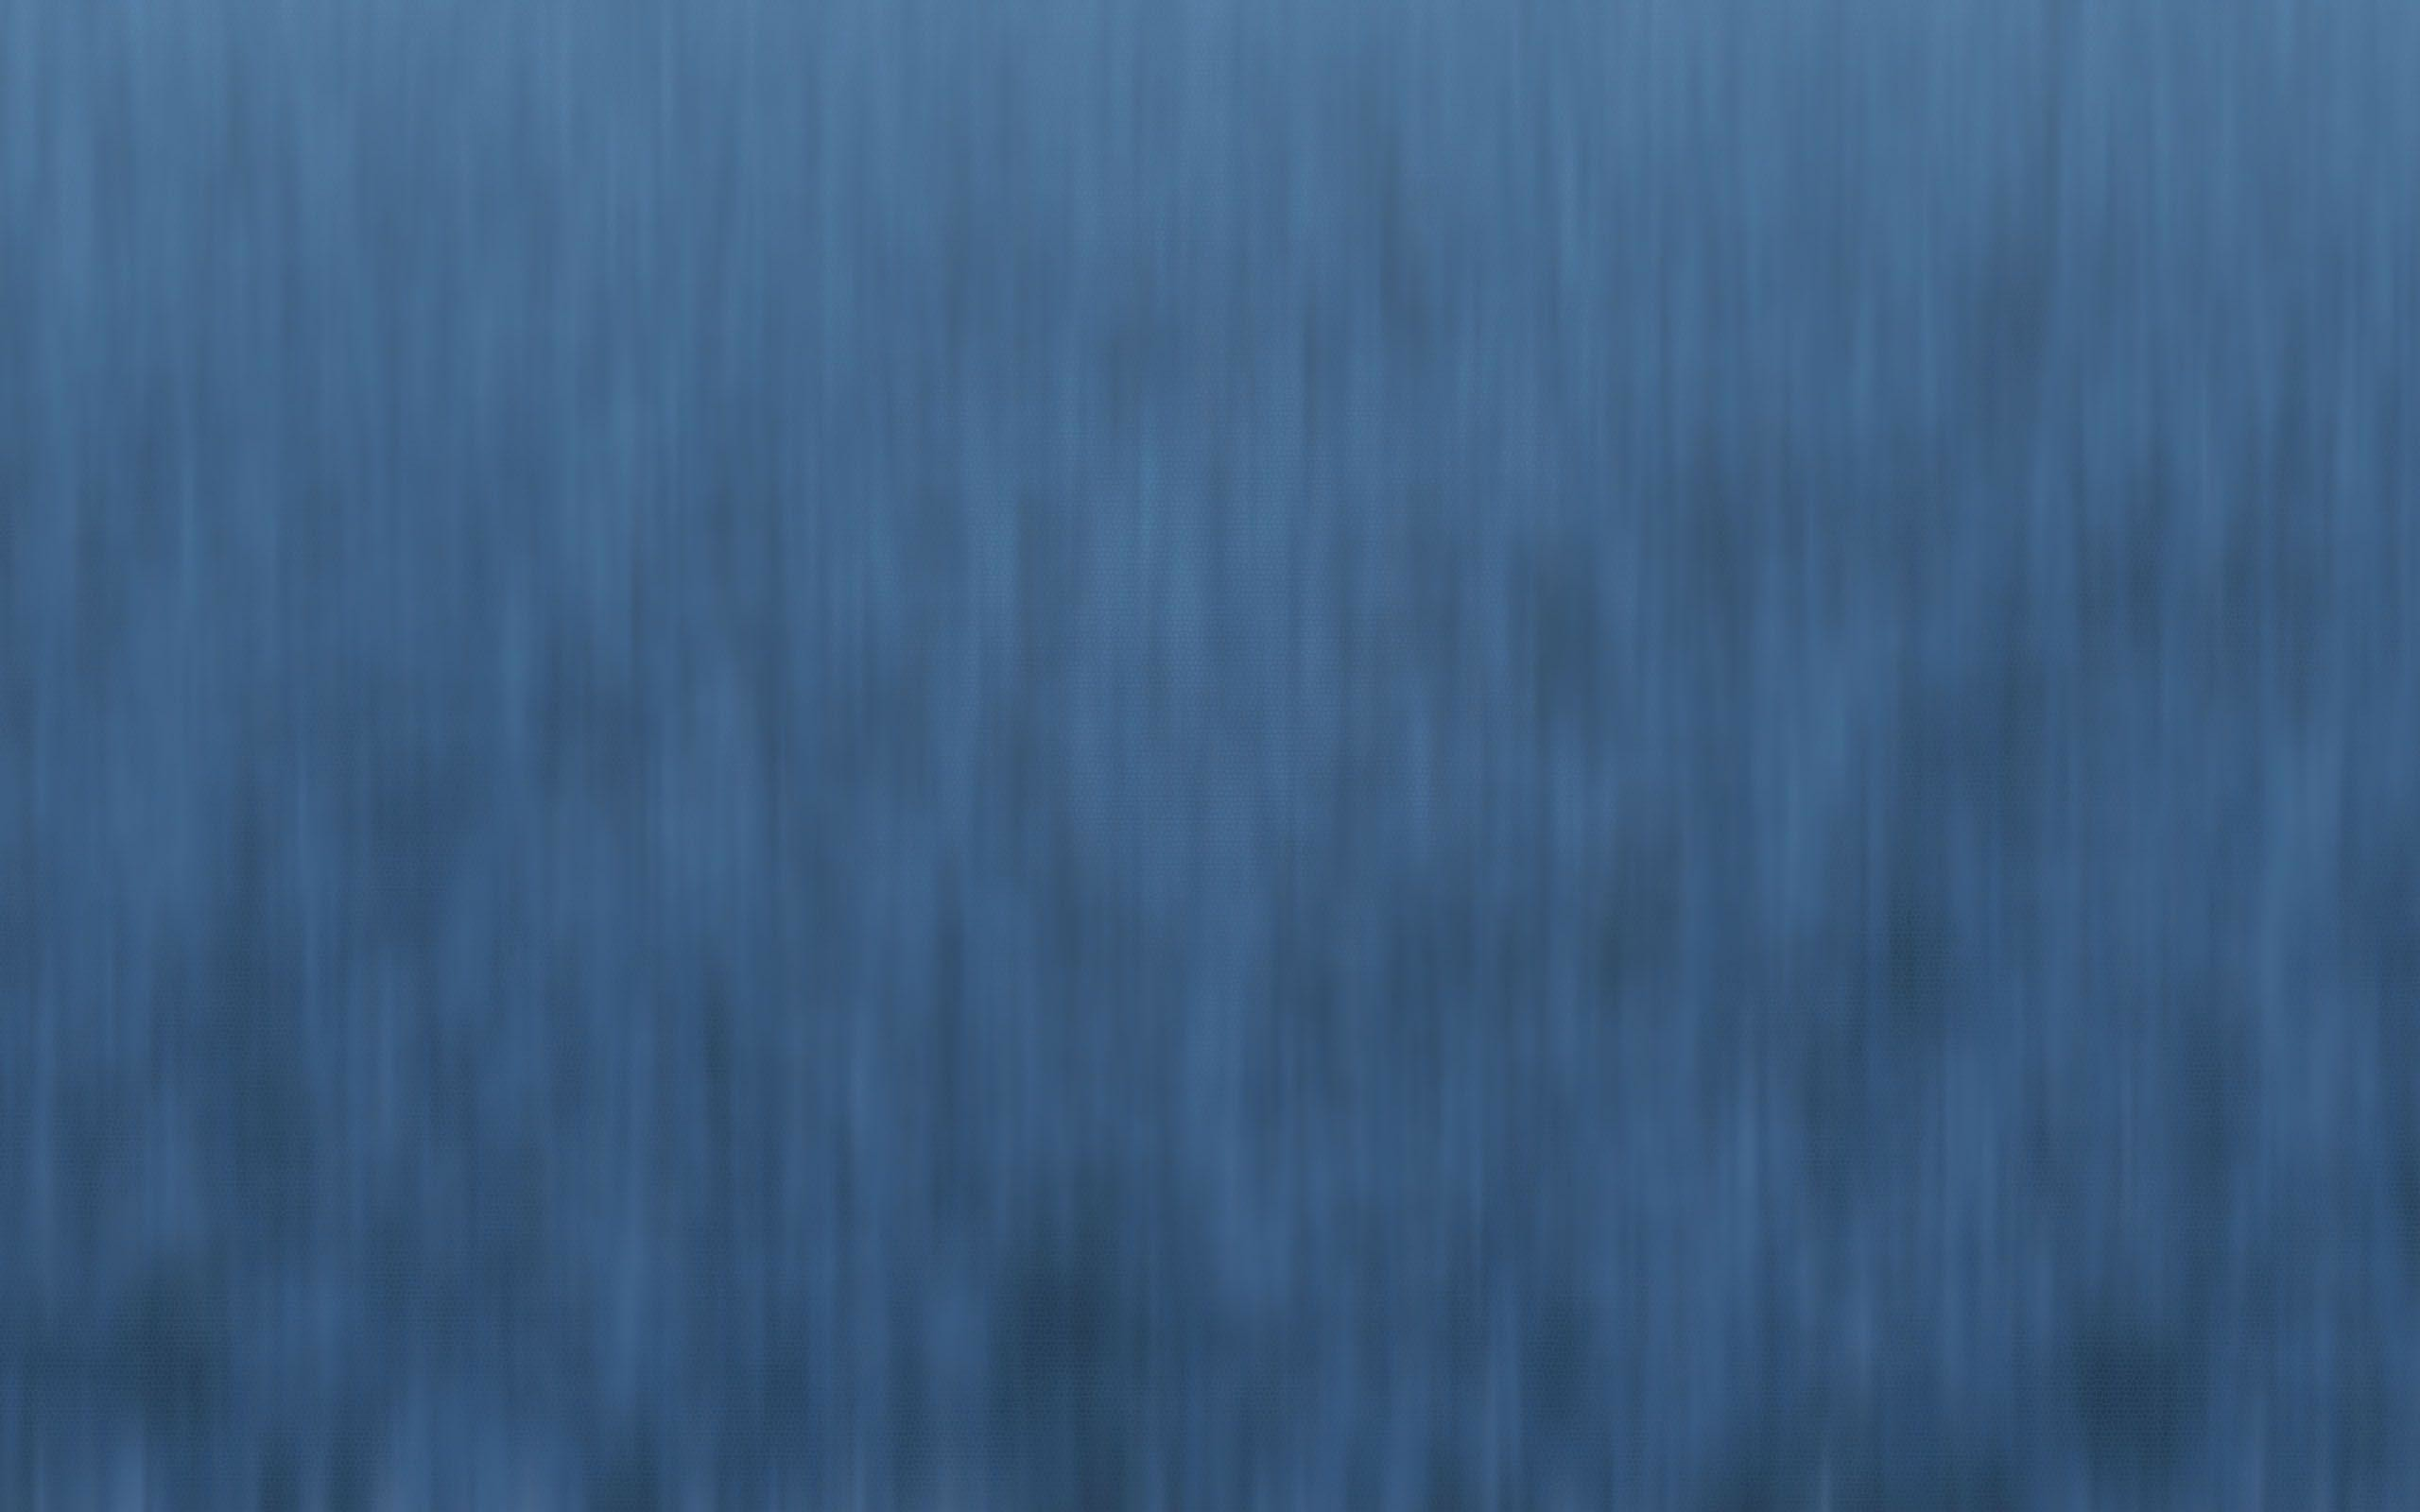 Simple Dark Blue Wallpapers Hd 1080P 11 HD Wallpapers | Hdimges.